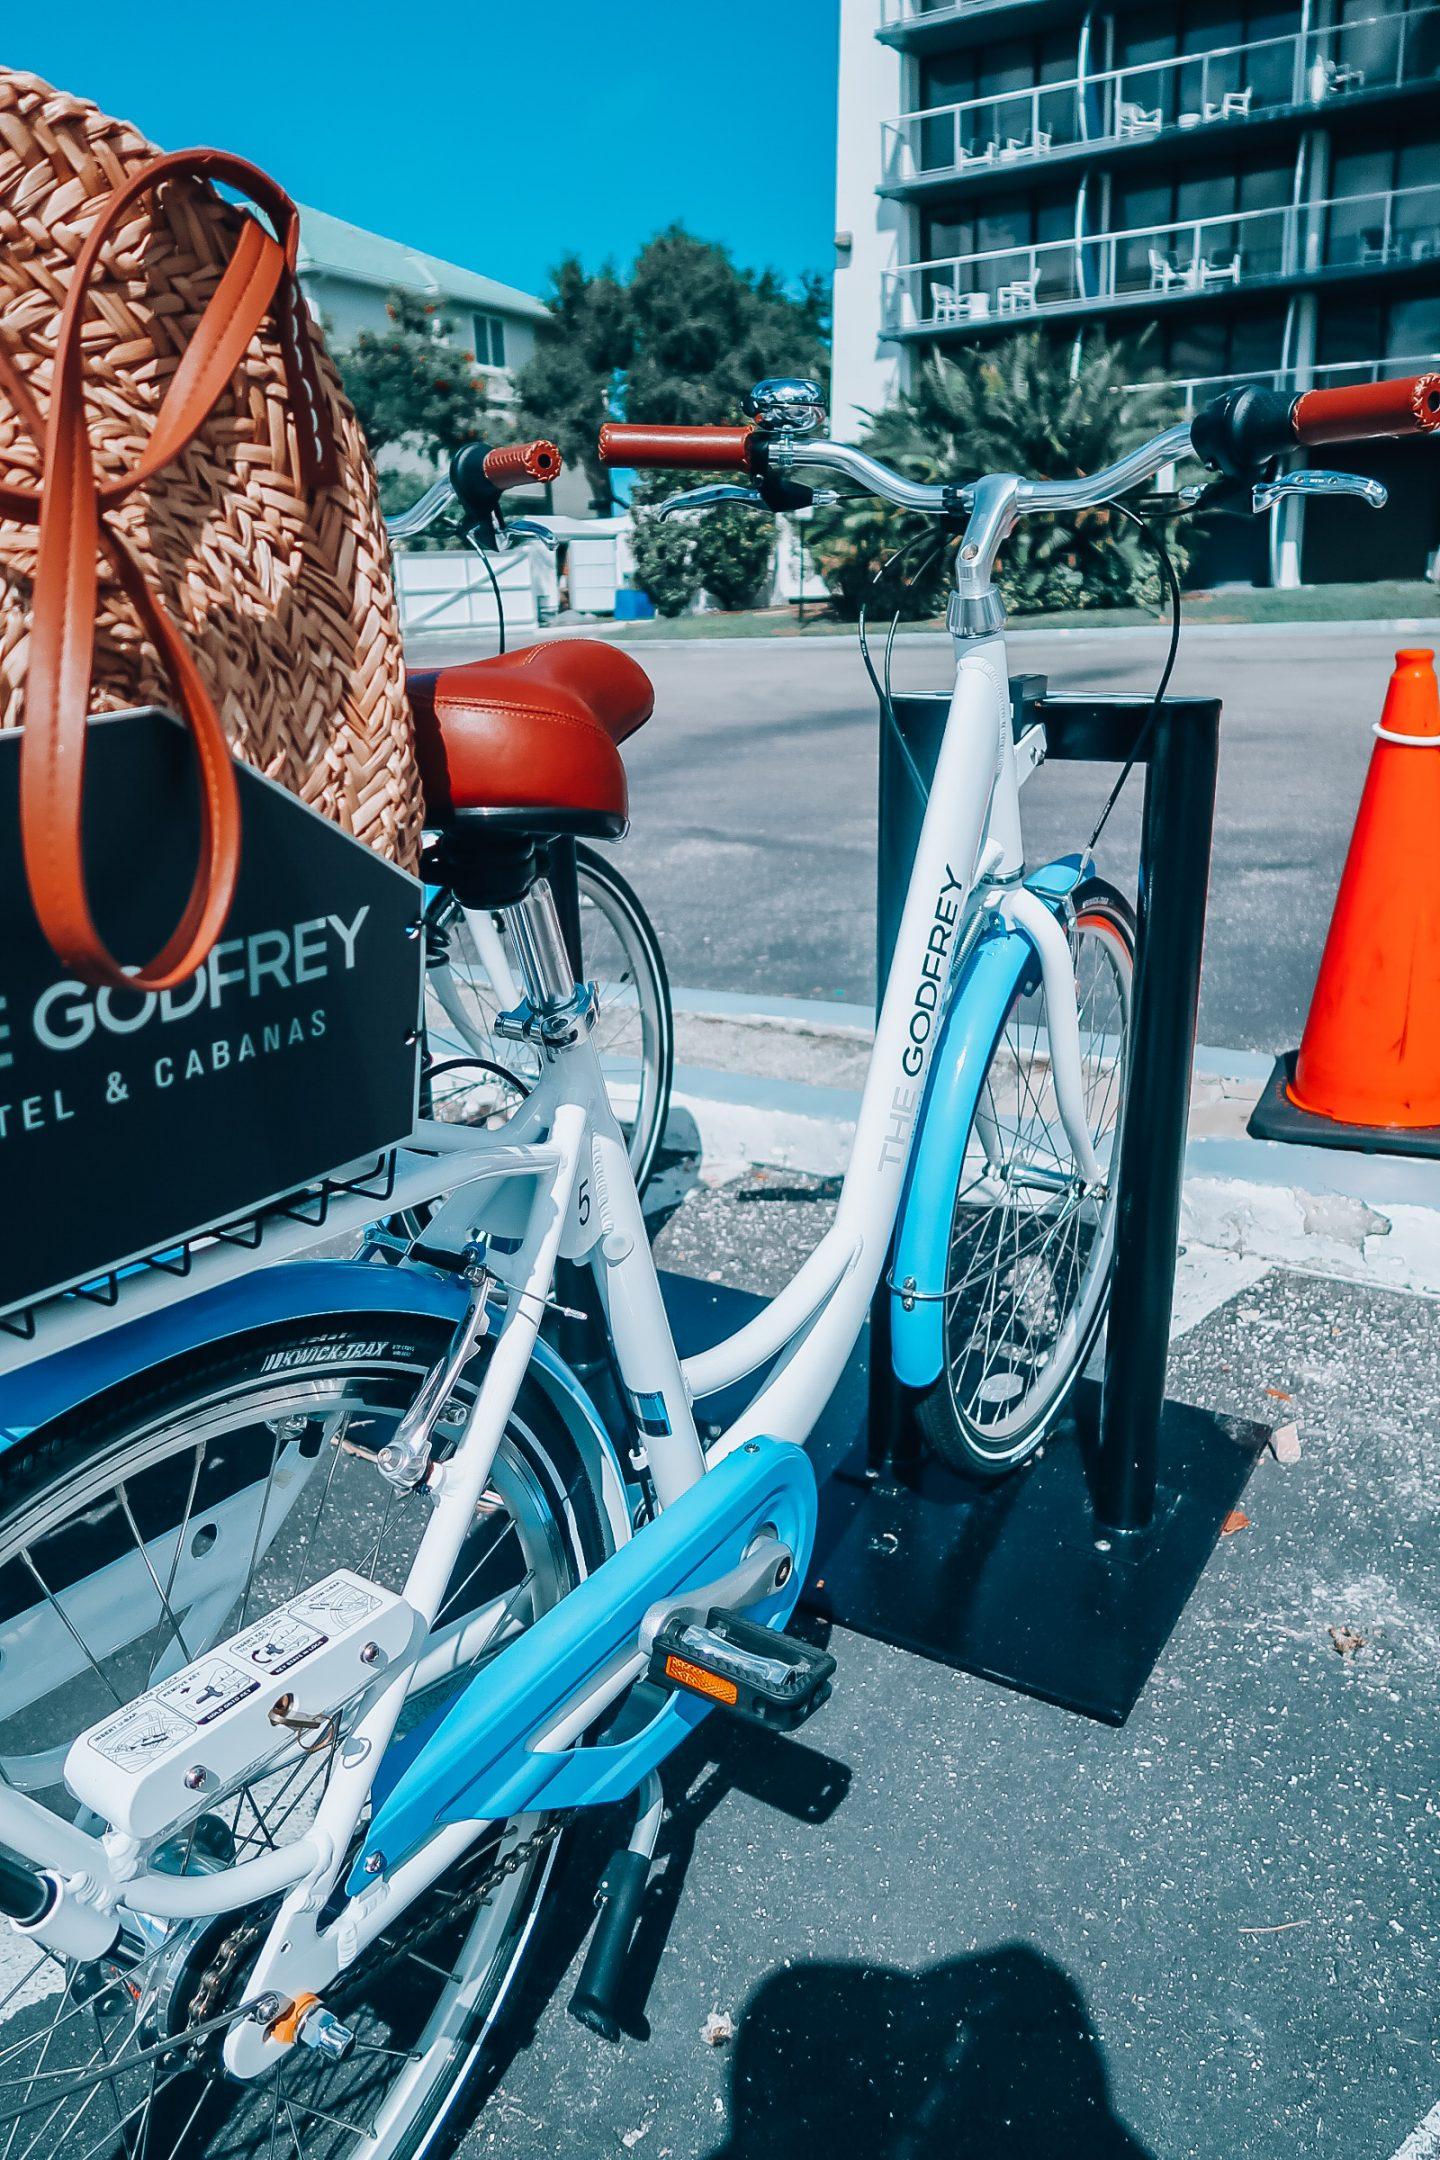 Godfrey Hotel & Cabanas Tampa